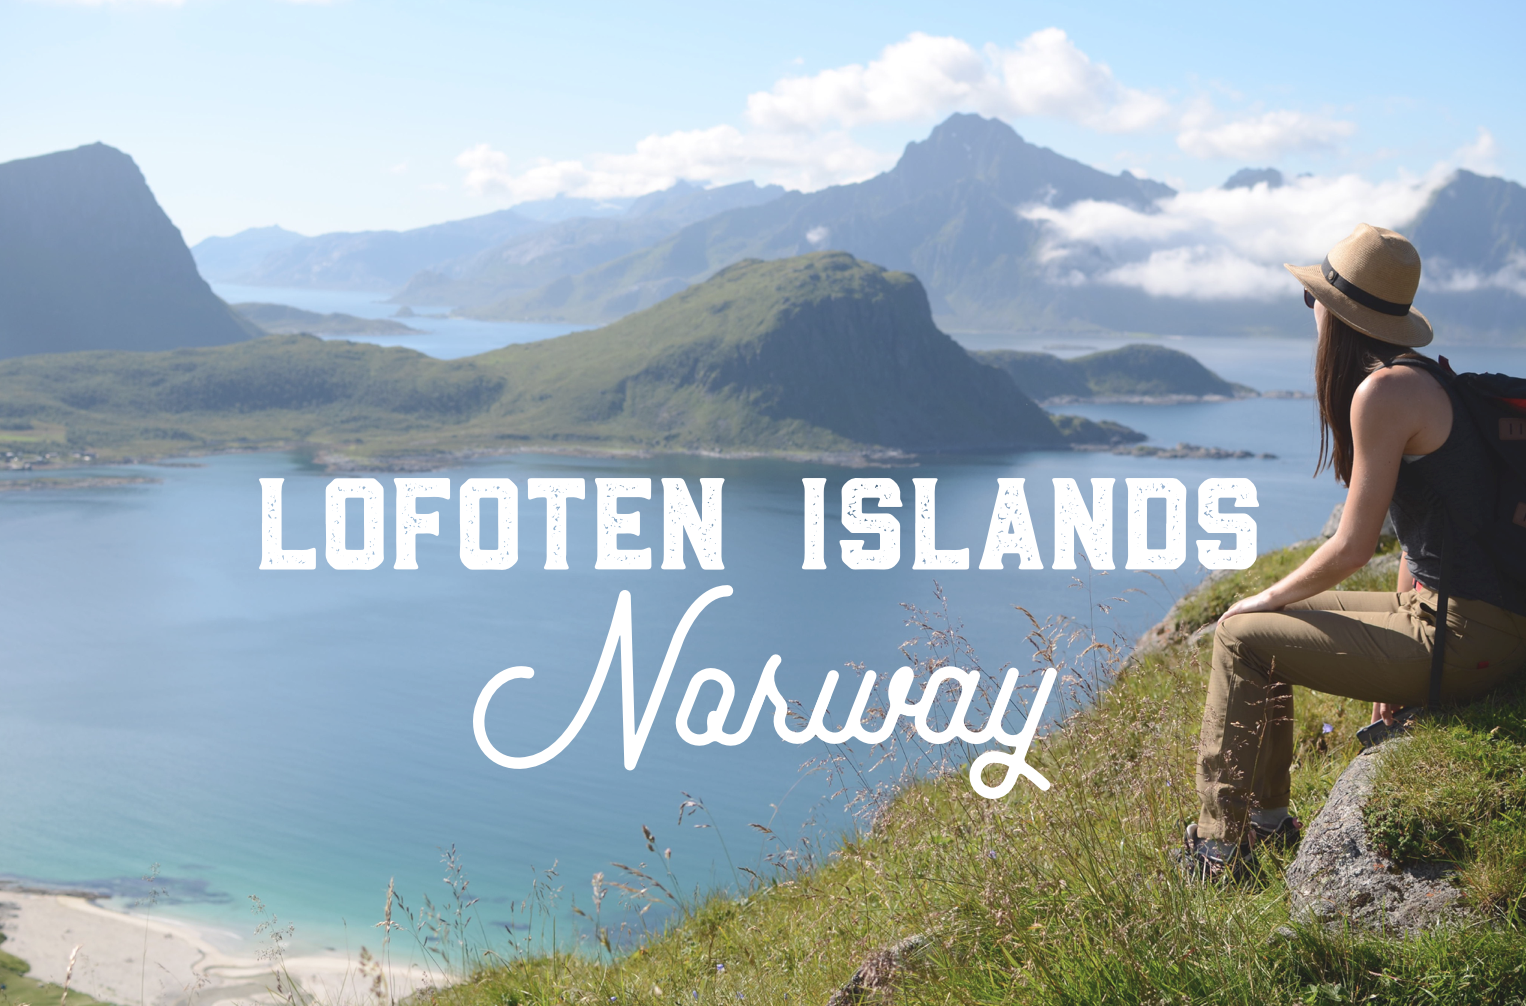 lofoten-islands-norway-travel-guide.png